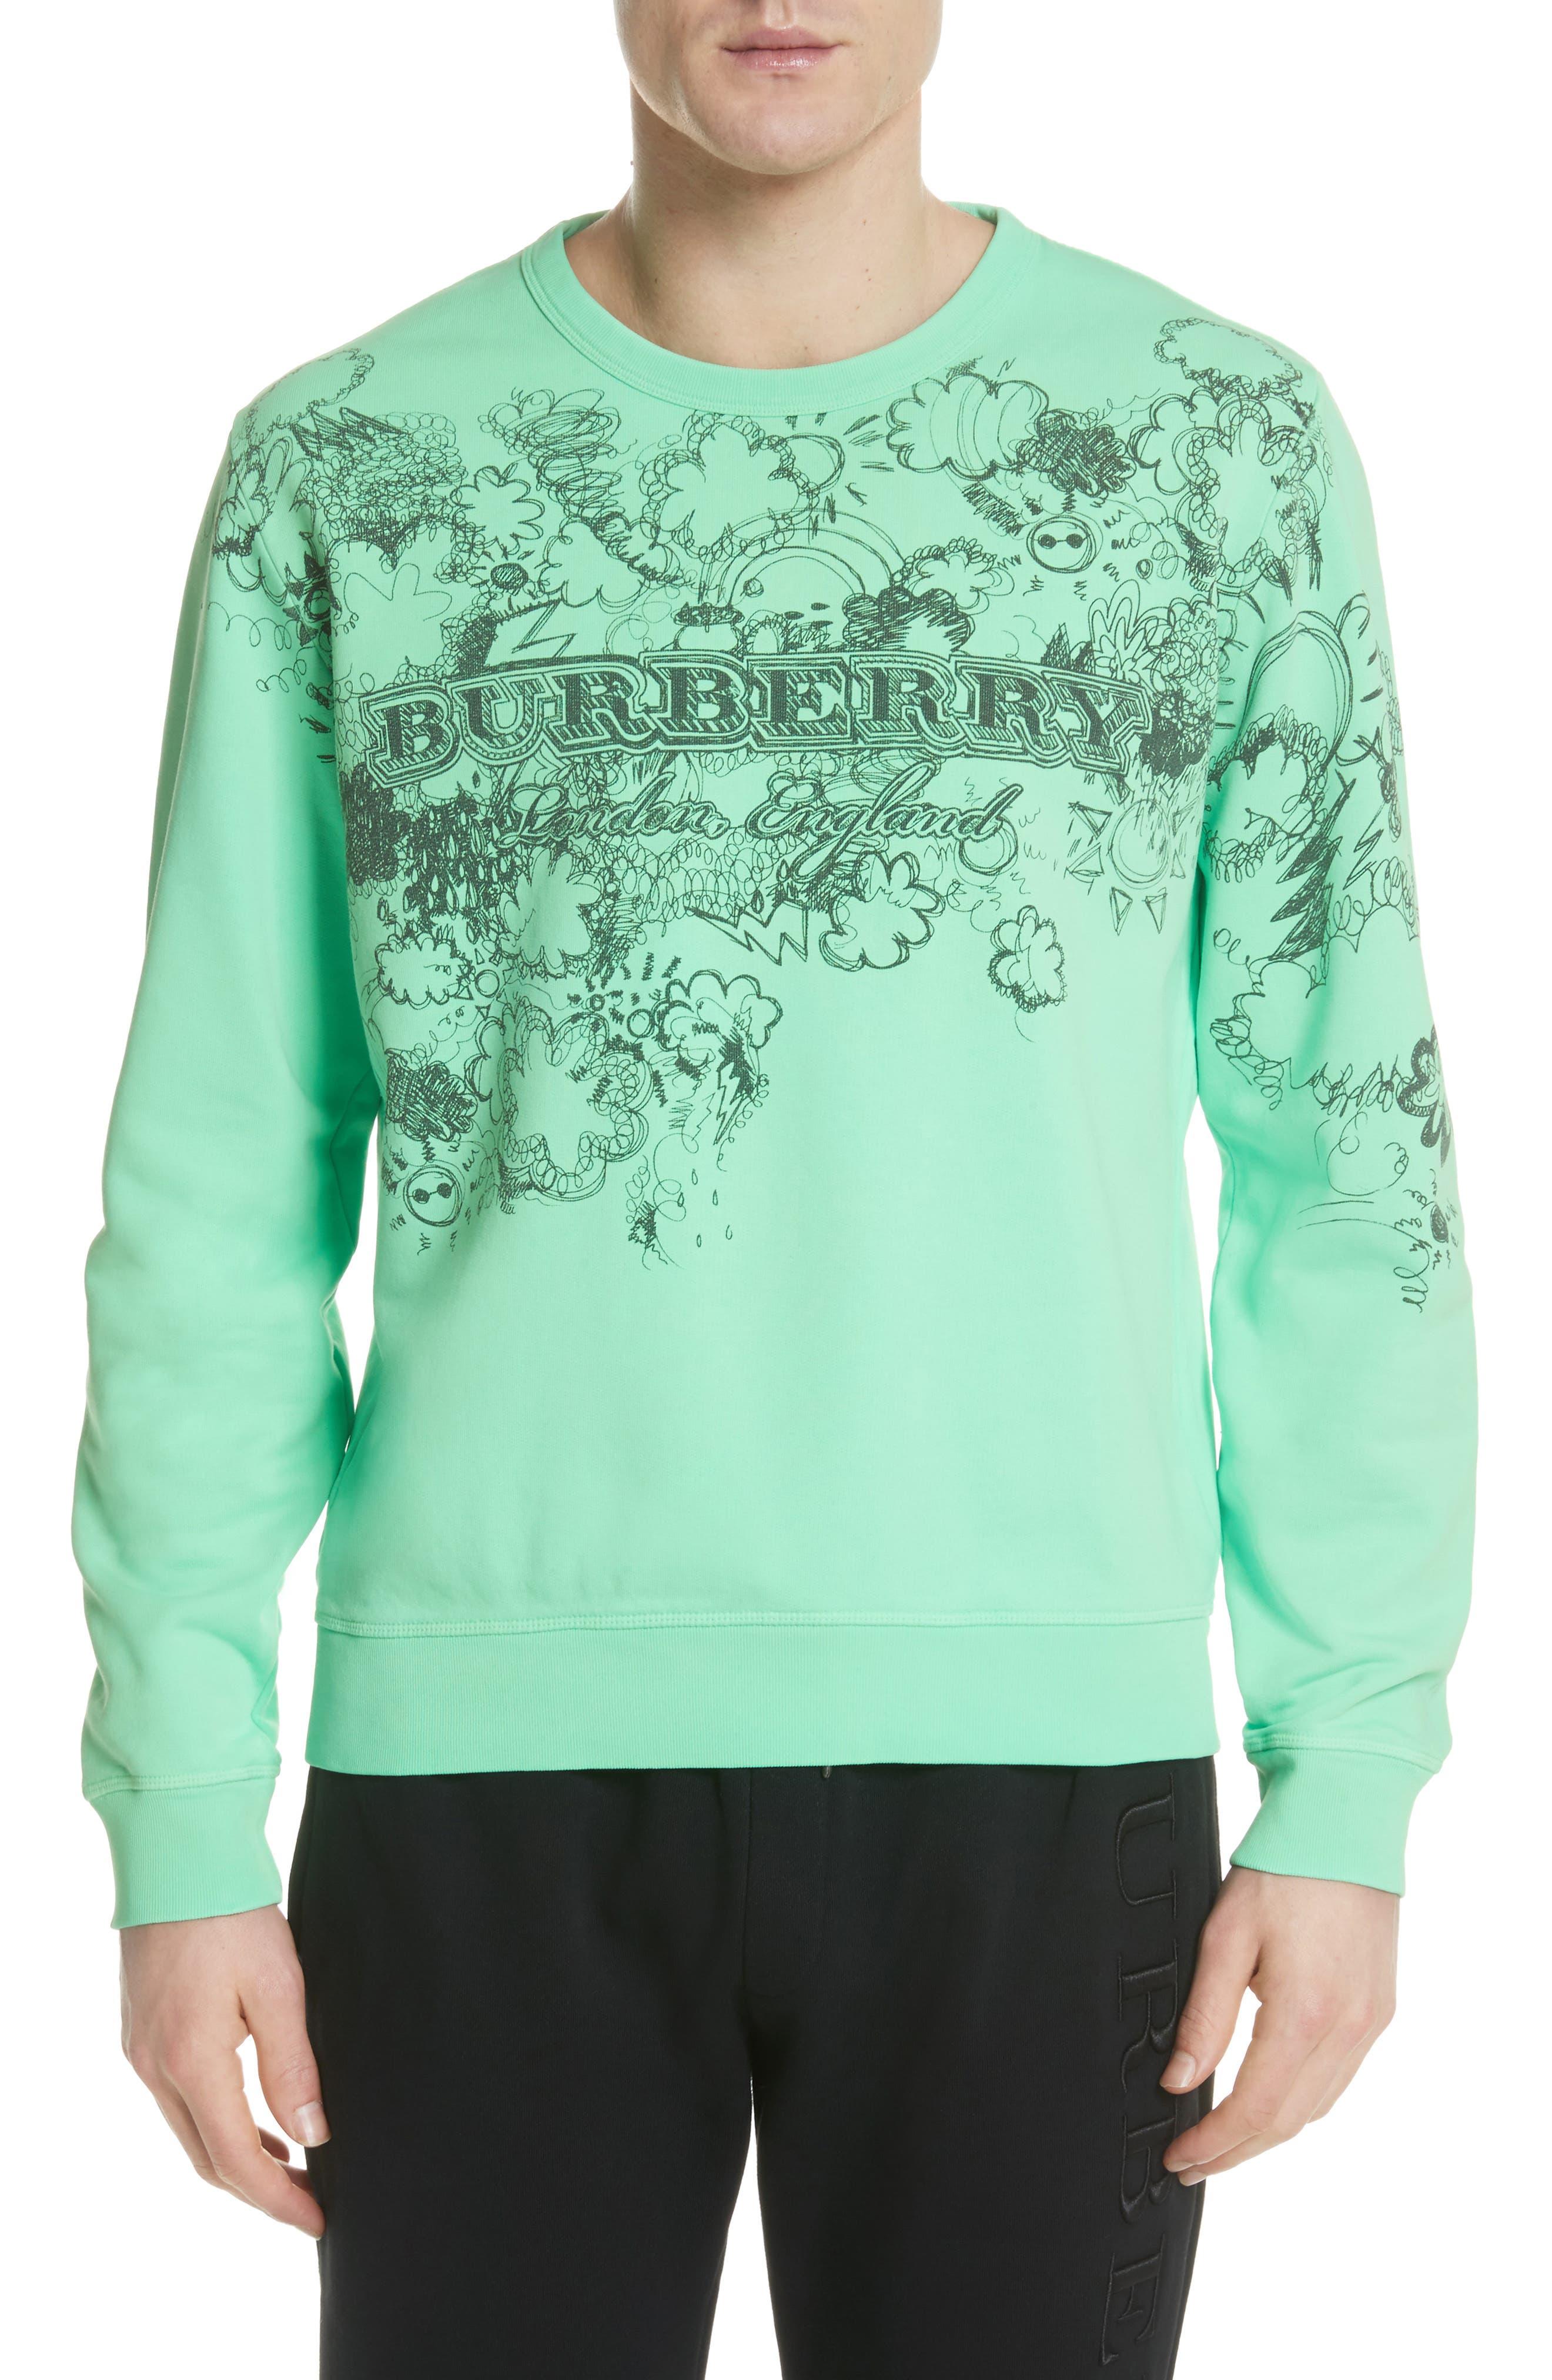 Madon Graphic Sweatshirt,                         Main,                         color, Bright Apple Green